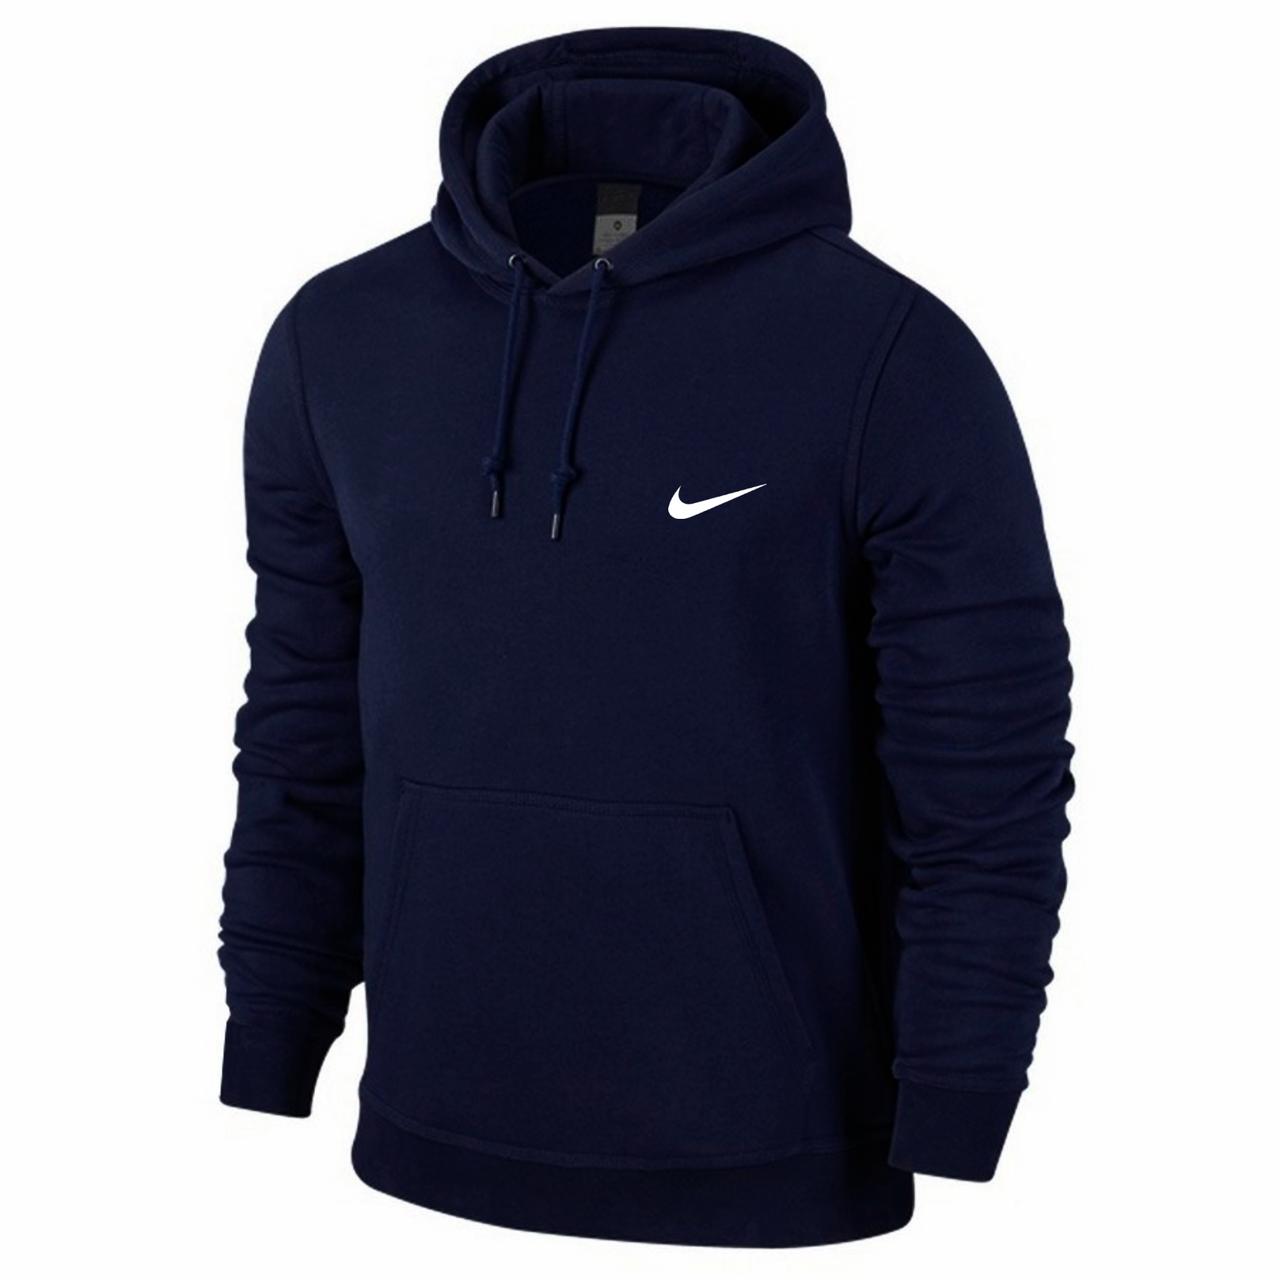 РАЗМЕР S Толстовка мужская кенгуру Nike, синяя